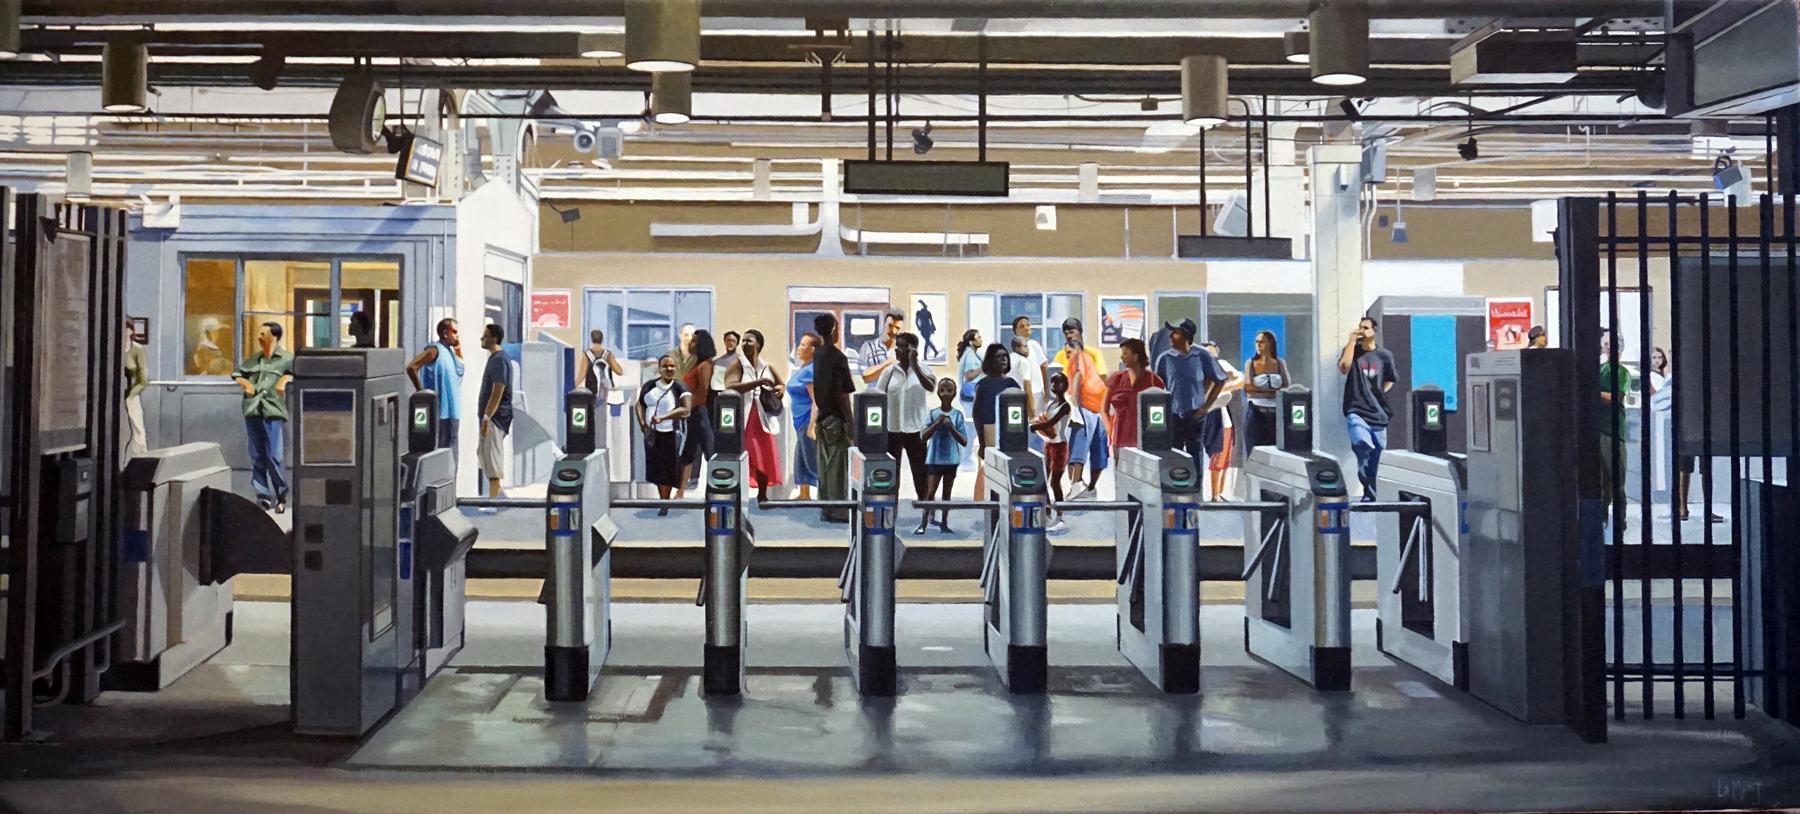 Susan Calloway Fine Arts-Susan Lamont-A Long Way To Go-Oil on linen-18x40-$4600.jpg